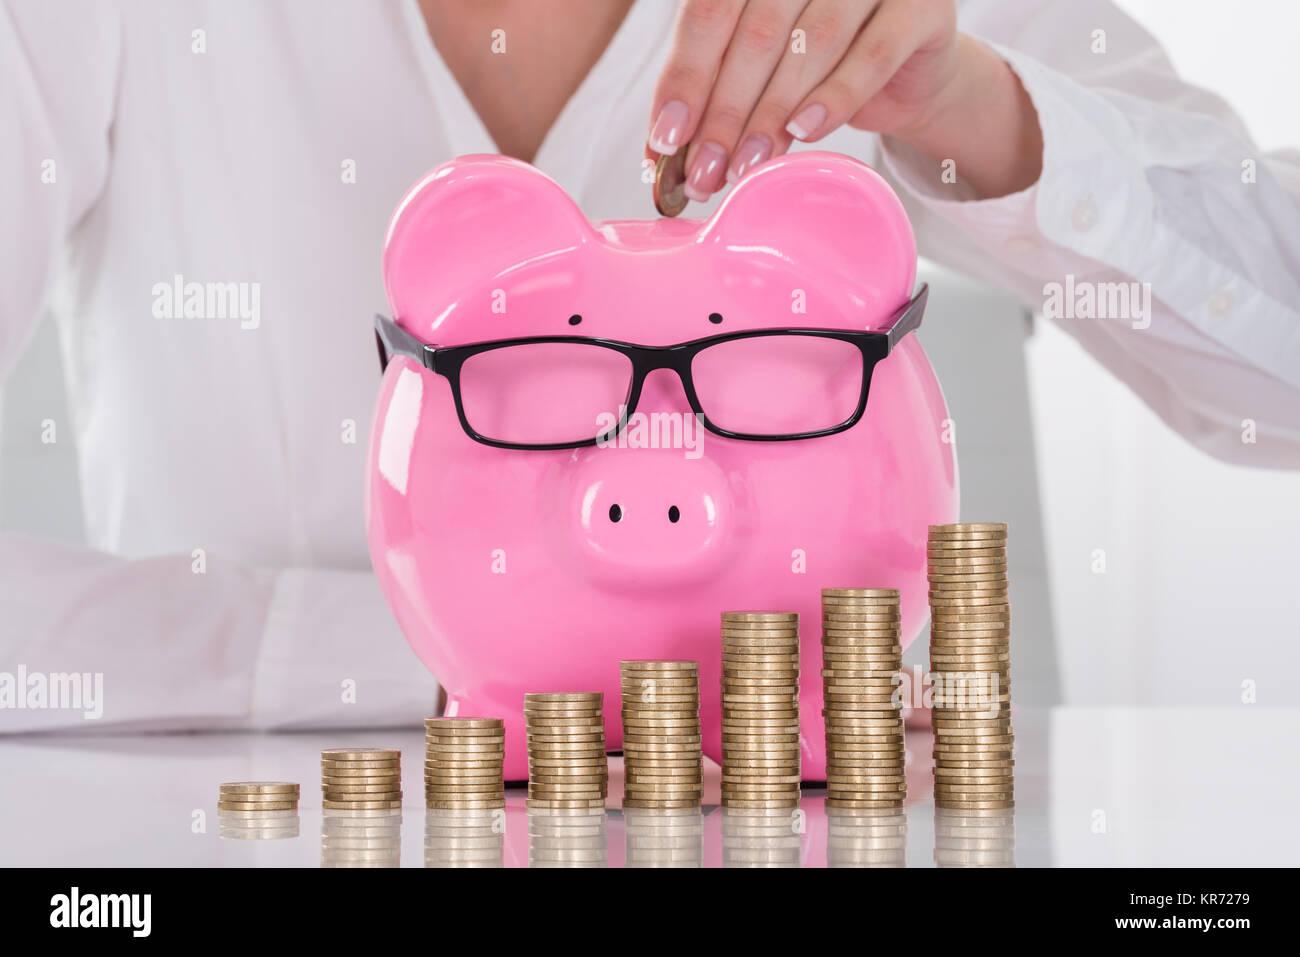 Female's Hand Inserting Coin In Piggybank Stock Photo